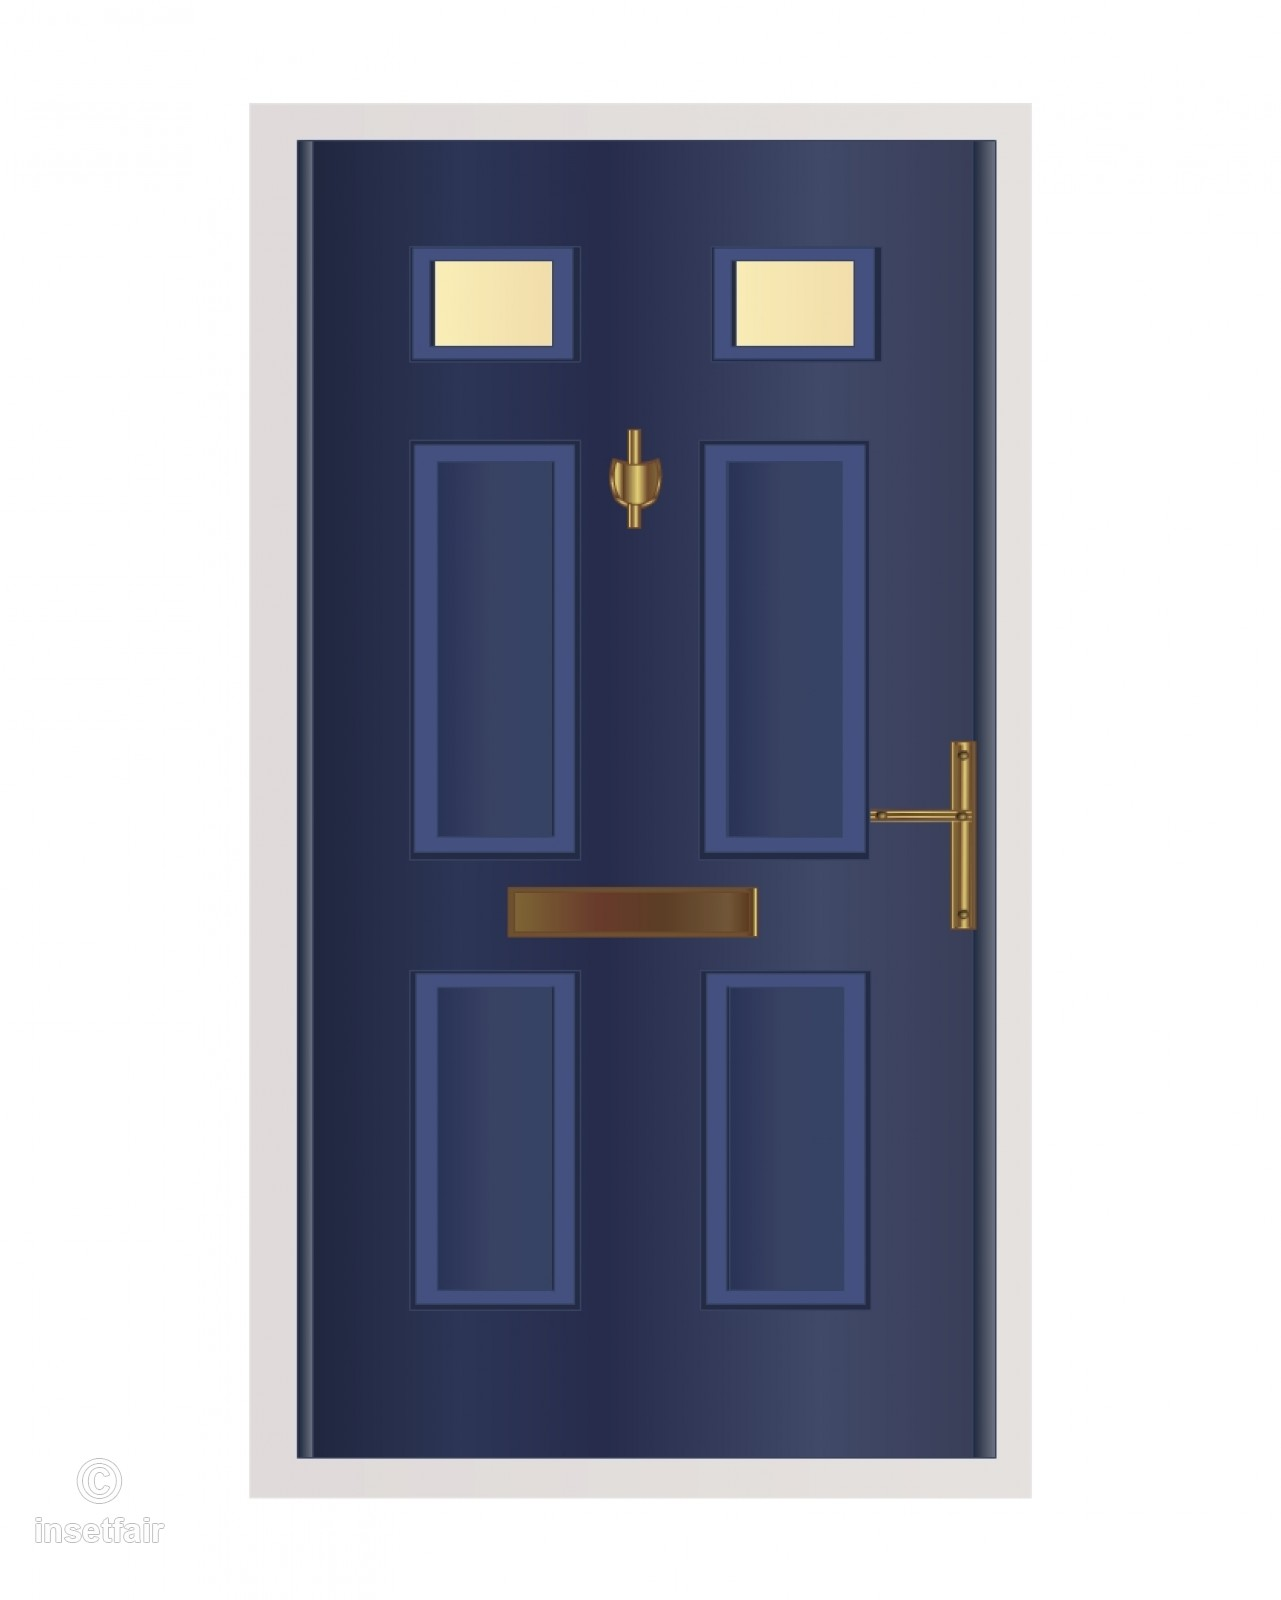 1281x1600 Pvc Blue Door Vector Cartoon Drawing